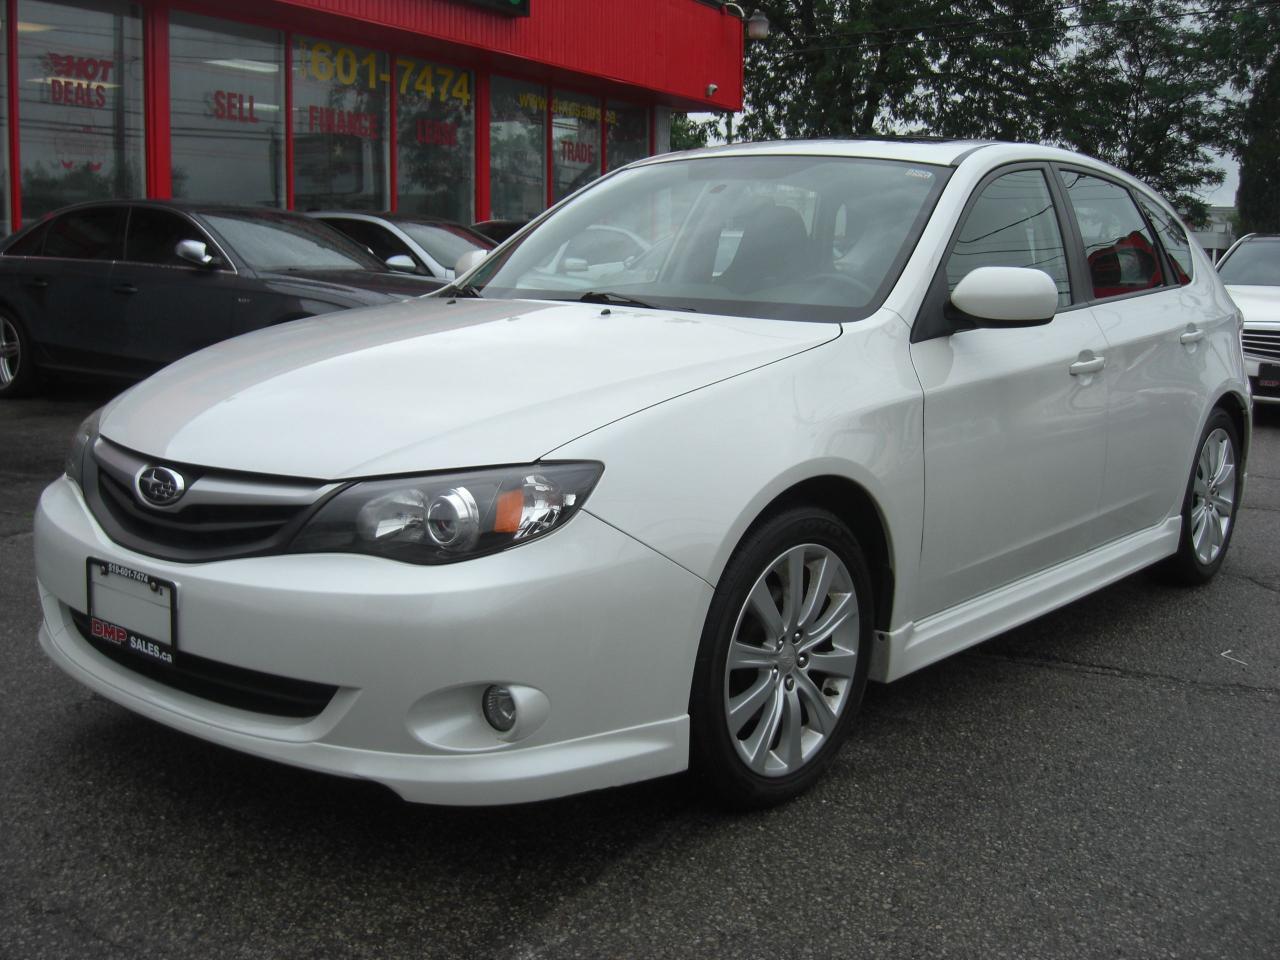 2010 Subaru Impreza 2.5i Limited AWD